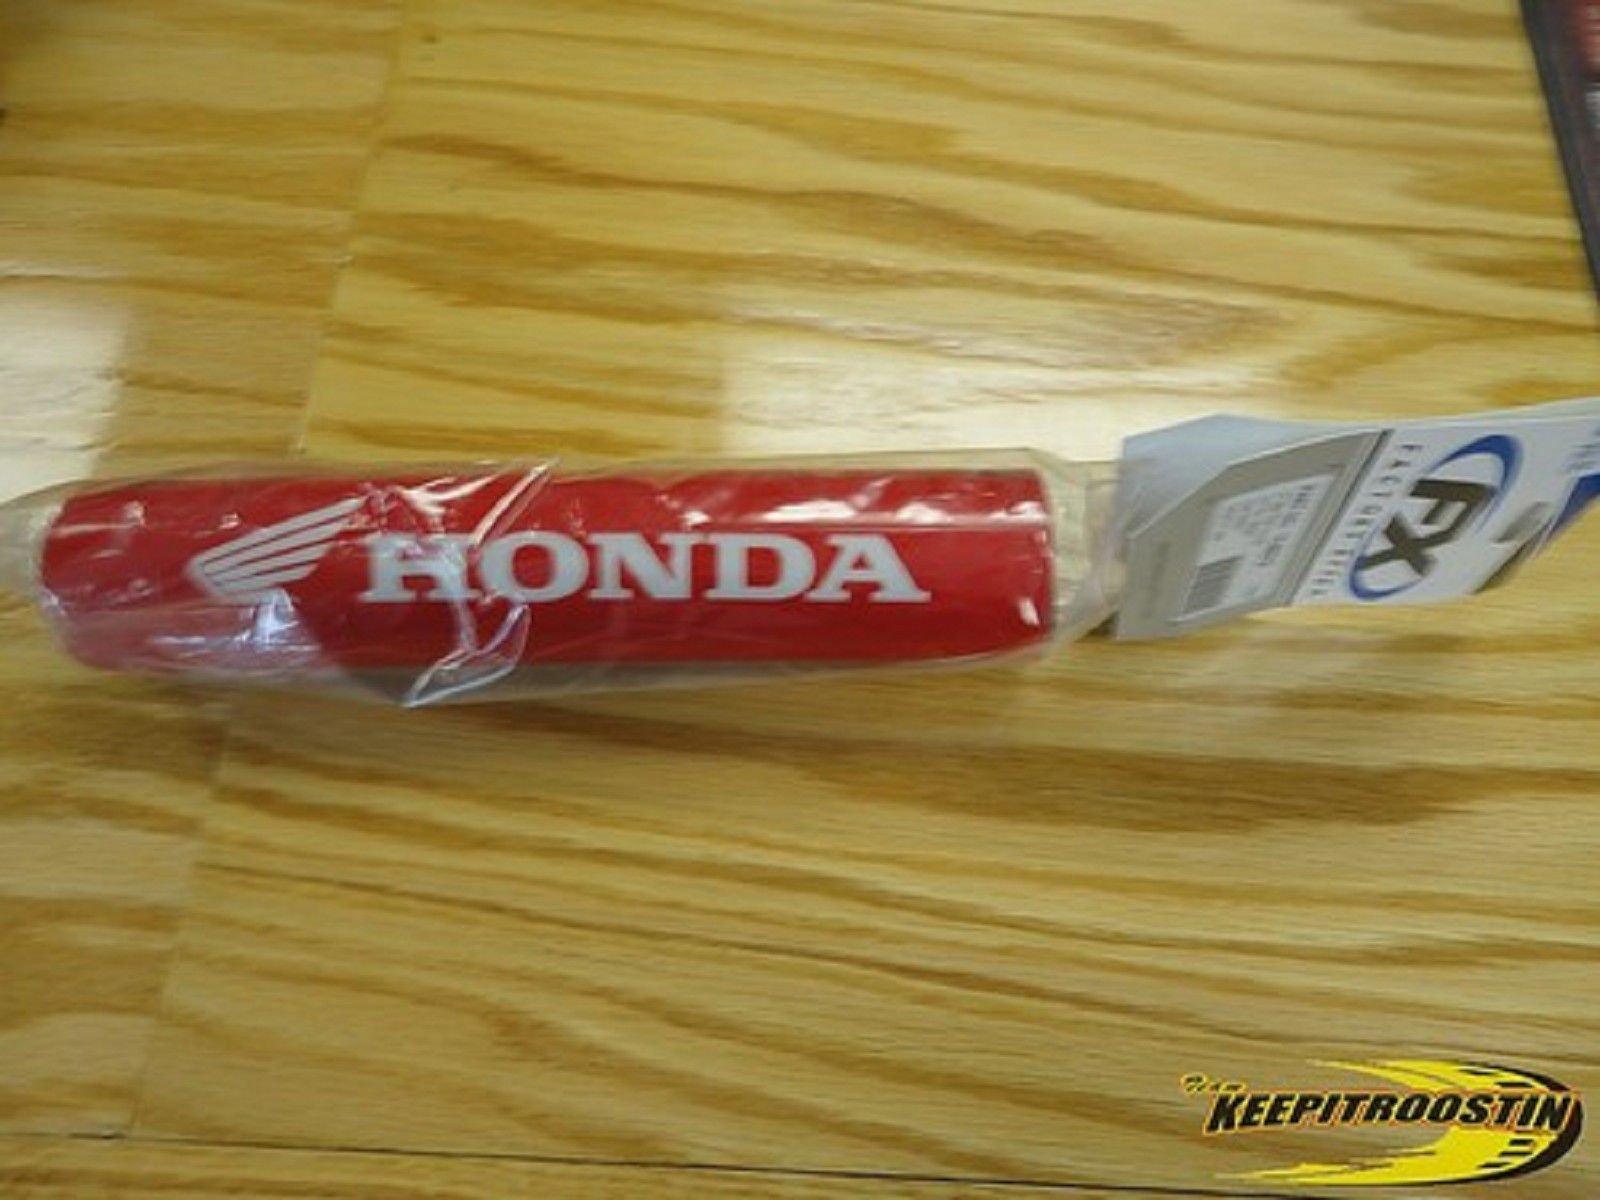 Fx Handlebar Pad Fits Honda Cr80 Cr85 Cr125 Cr250 Cr500 Crf250 Crf450 Crf150 Crf230 Xr200 Xr250 Xr500 Xr400 Xr650 1980-2014